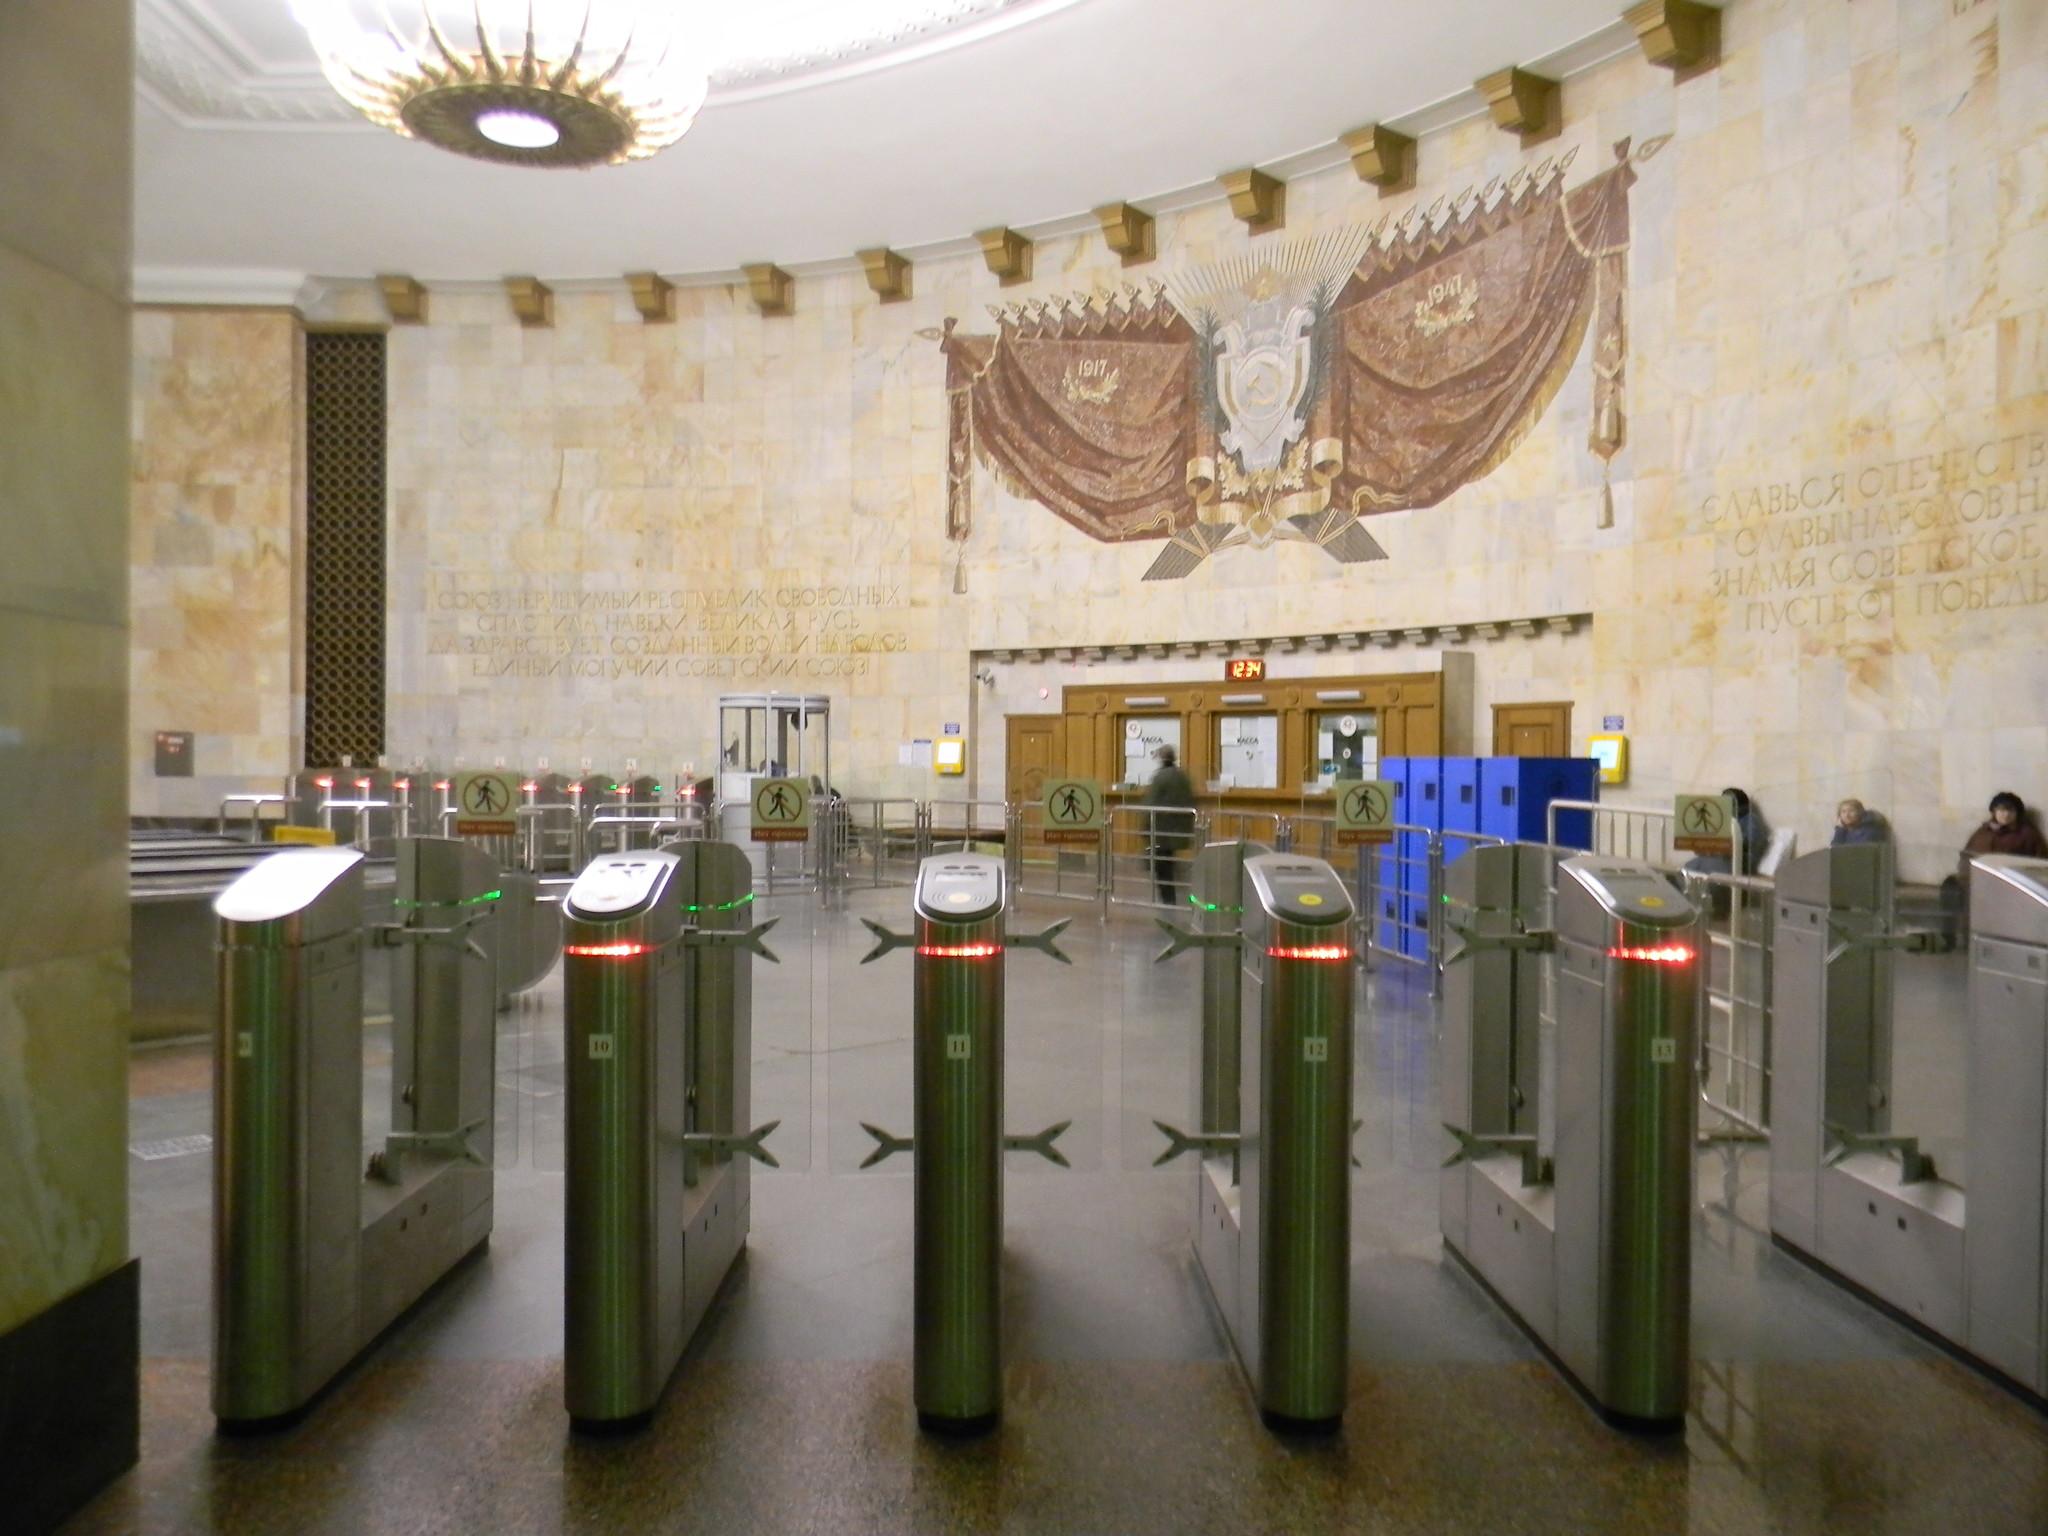 Станция «Площадь Революции» Московского метрополитена